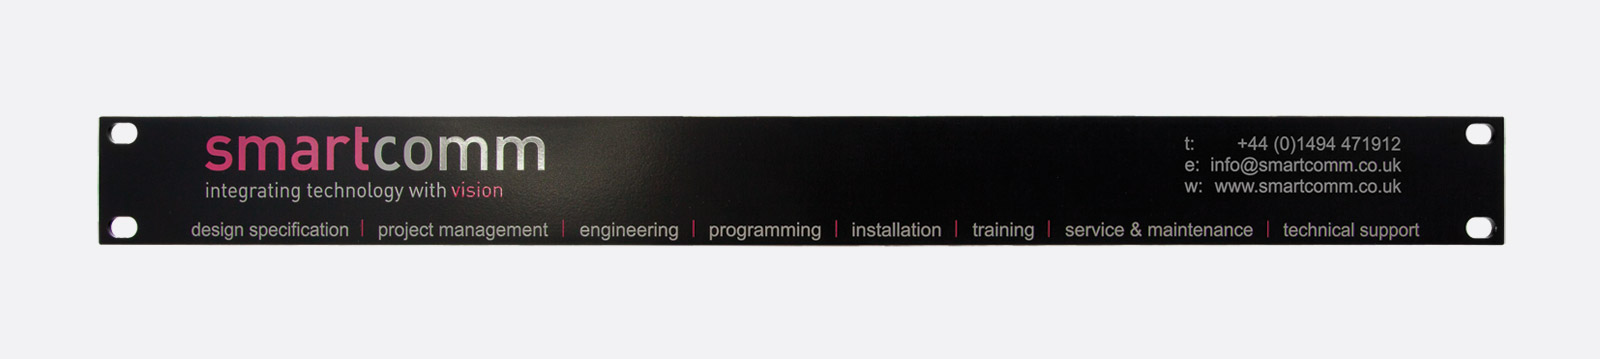 CANFORD RACK BLANK PANEL 1U, steel, black, with custom 1 colour print